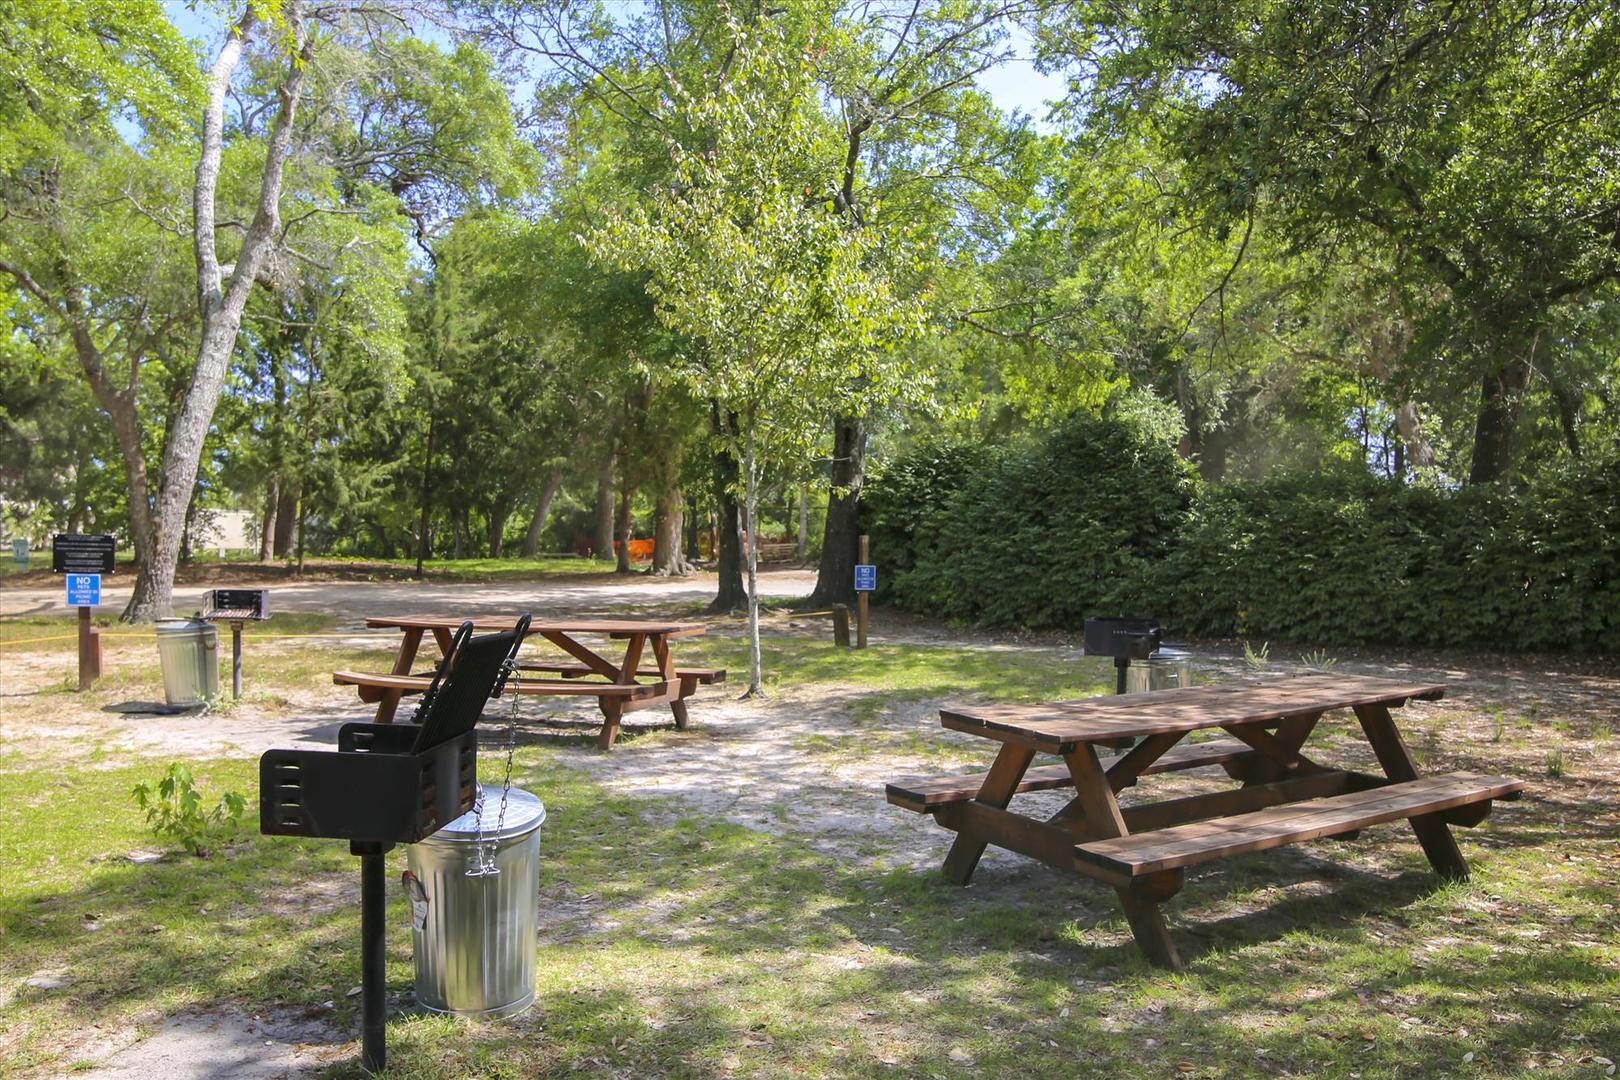 Ocean Creek Grilling and Picnic Area